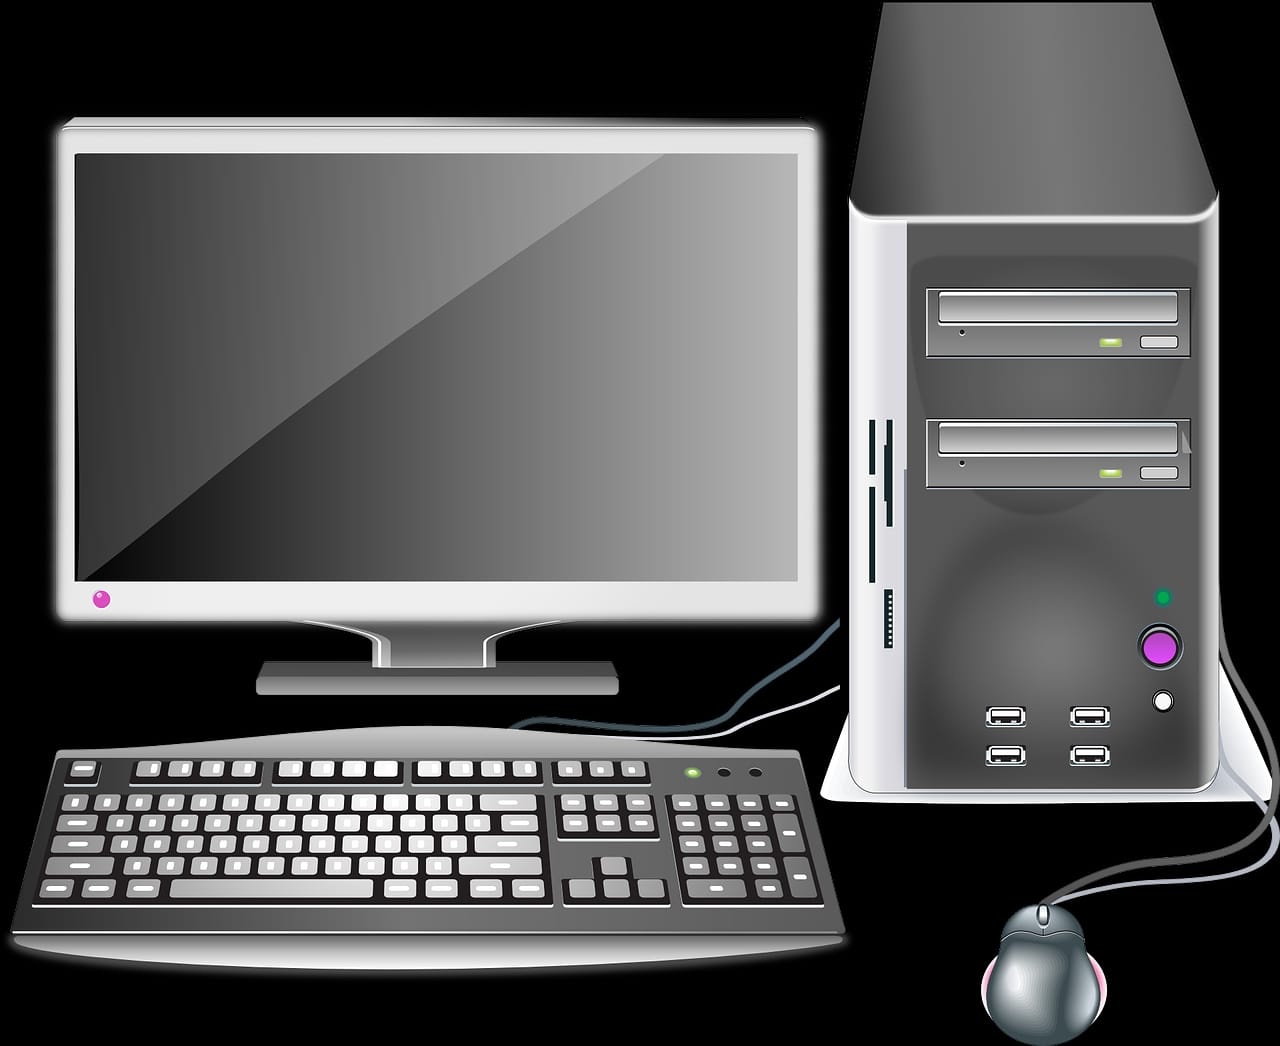 https://www.procareinfo.com/2020/05/types-of-monitors.html